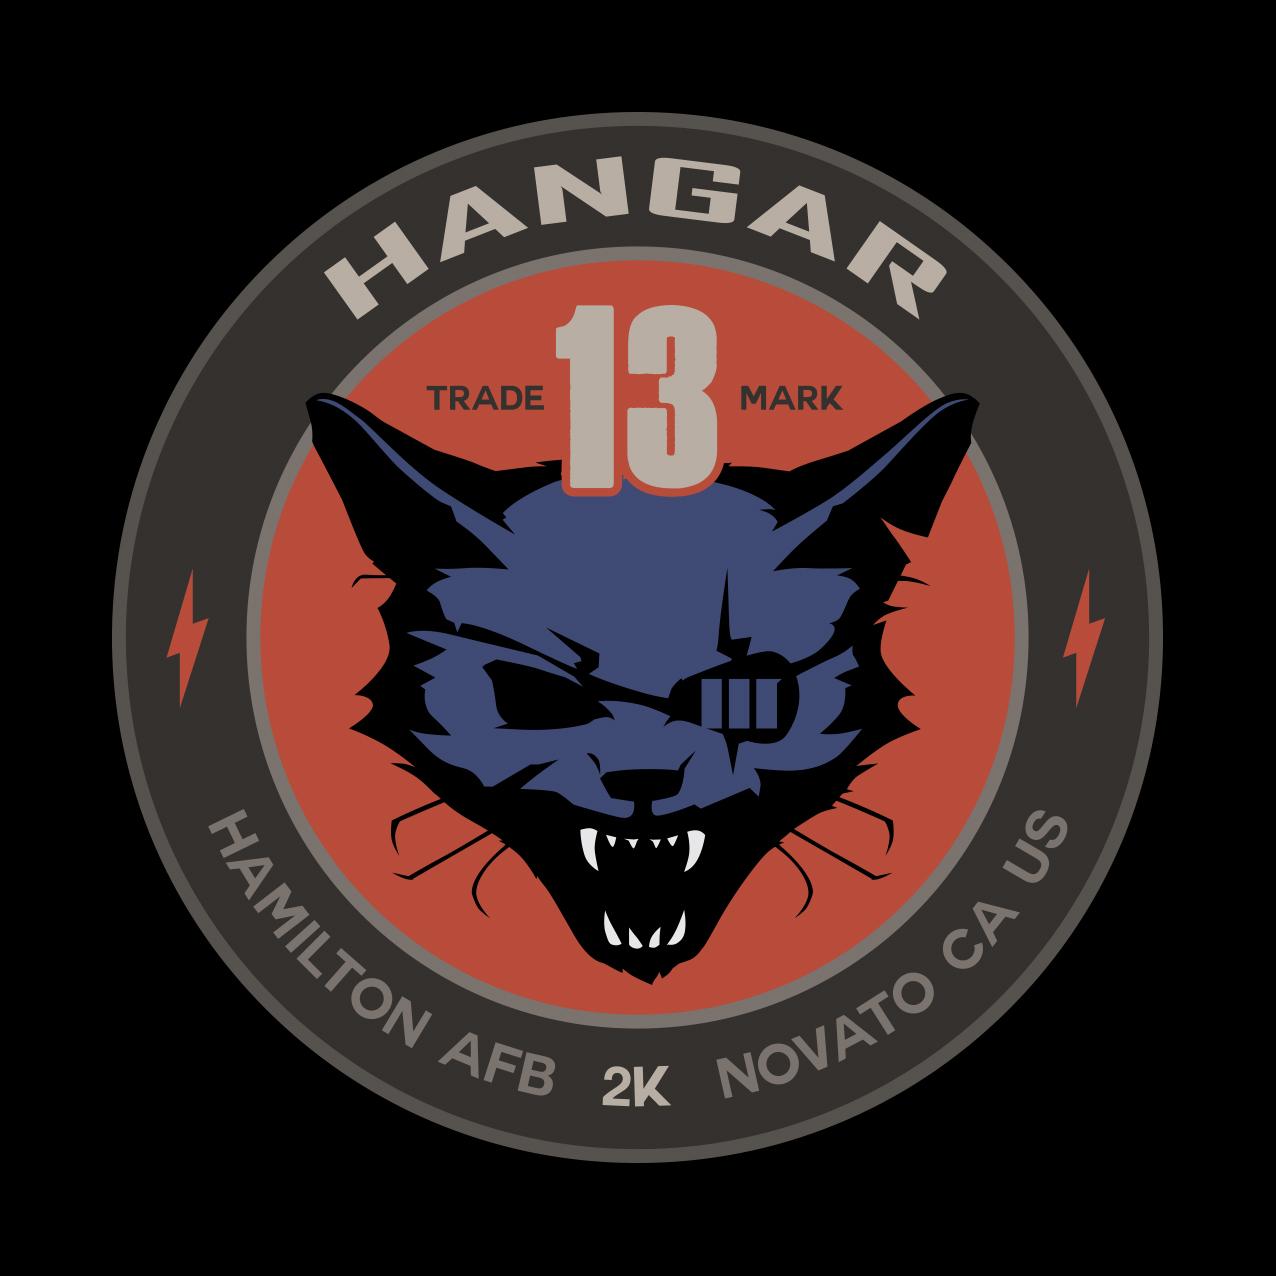 Hangar 13's logo